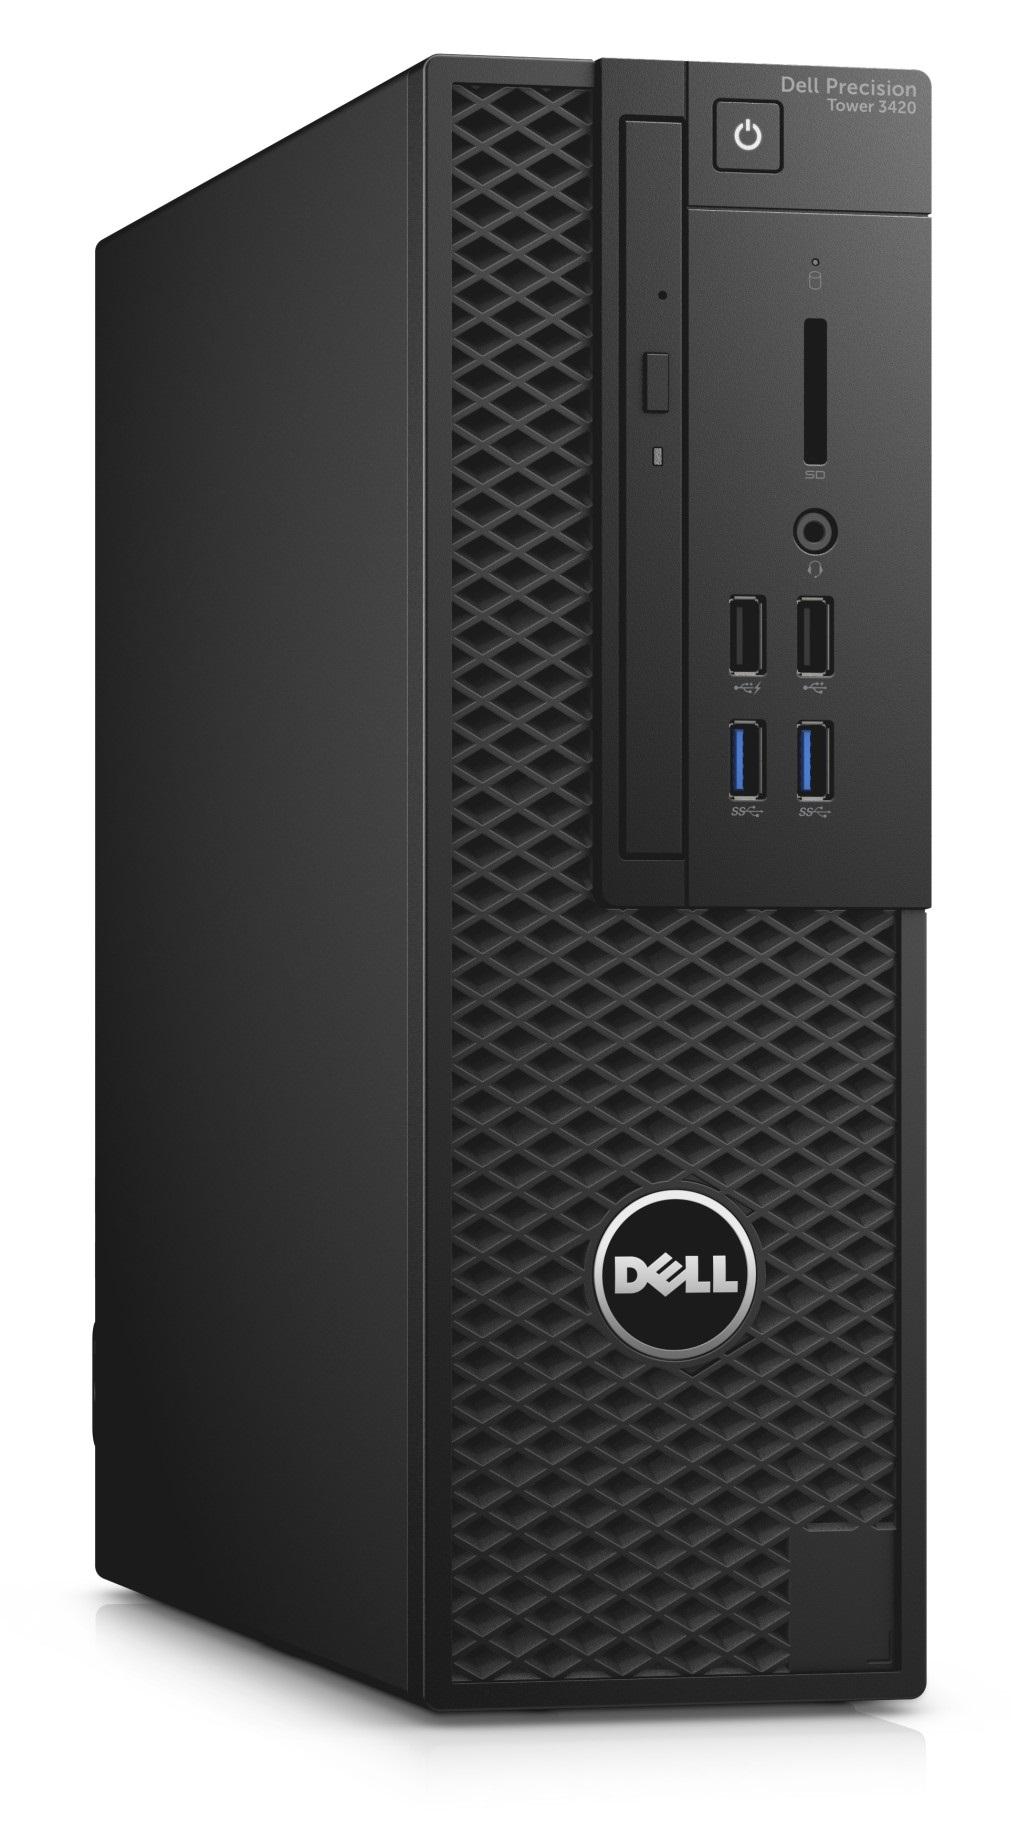 Dell Precision T3420 SFF i7-6700/16G/256SSD+1TB/K620-2G/HDMI/DP/DVD-RW/W7P+W10P/3RNBD